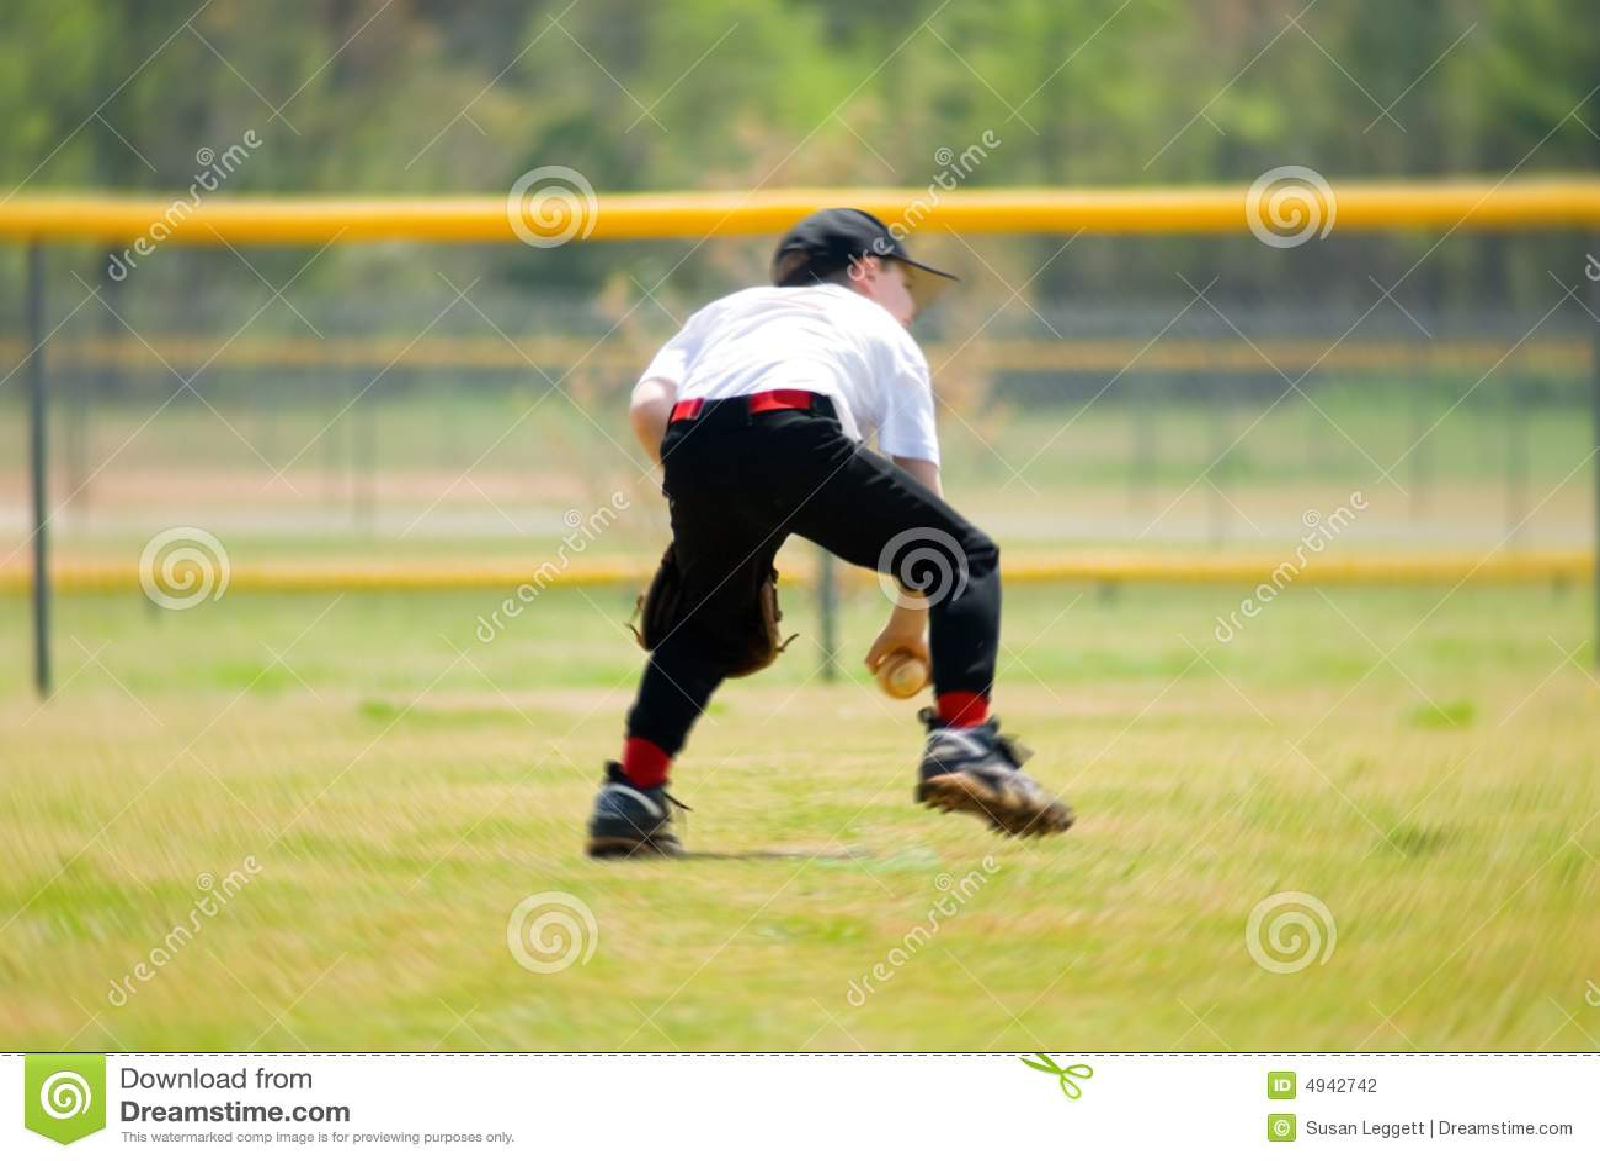 Catching Ground Ball/Blur